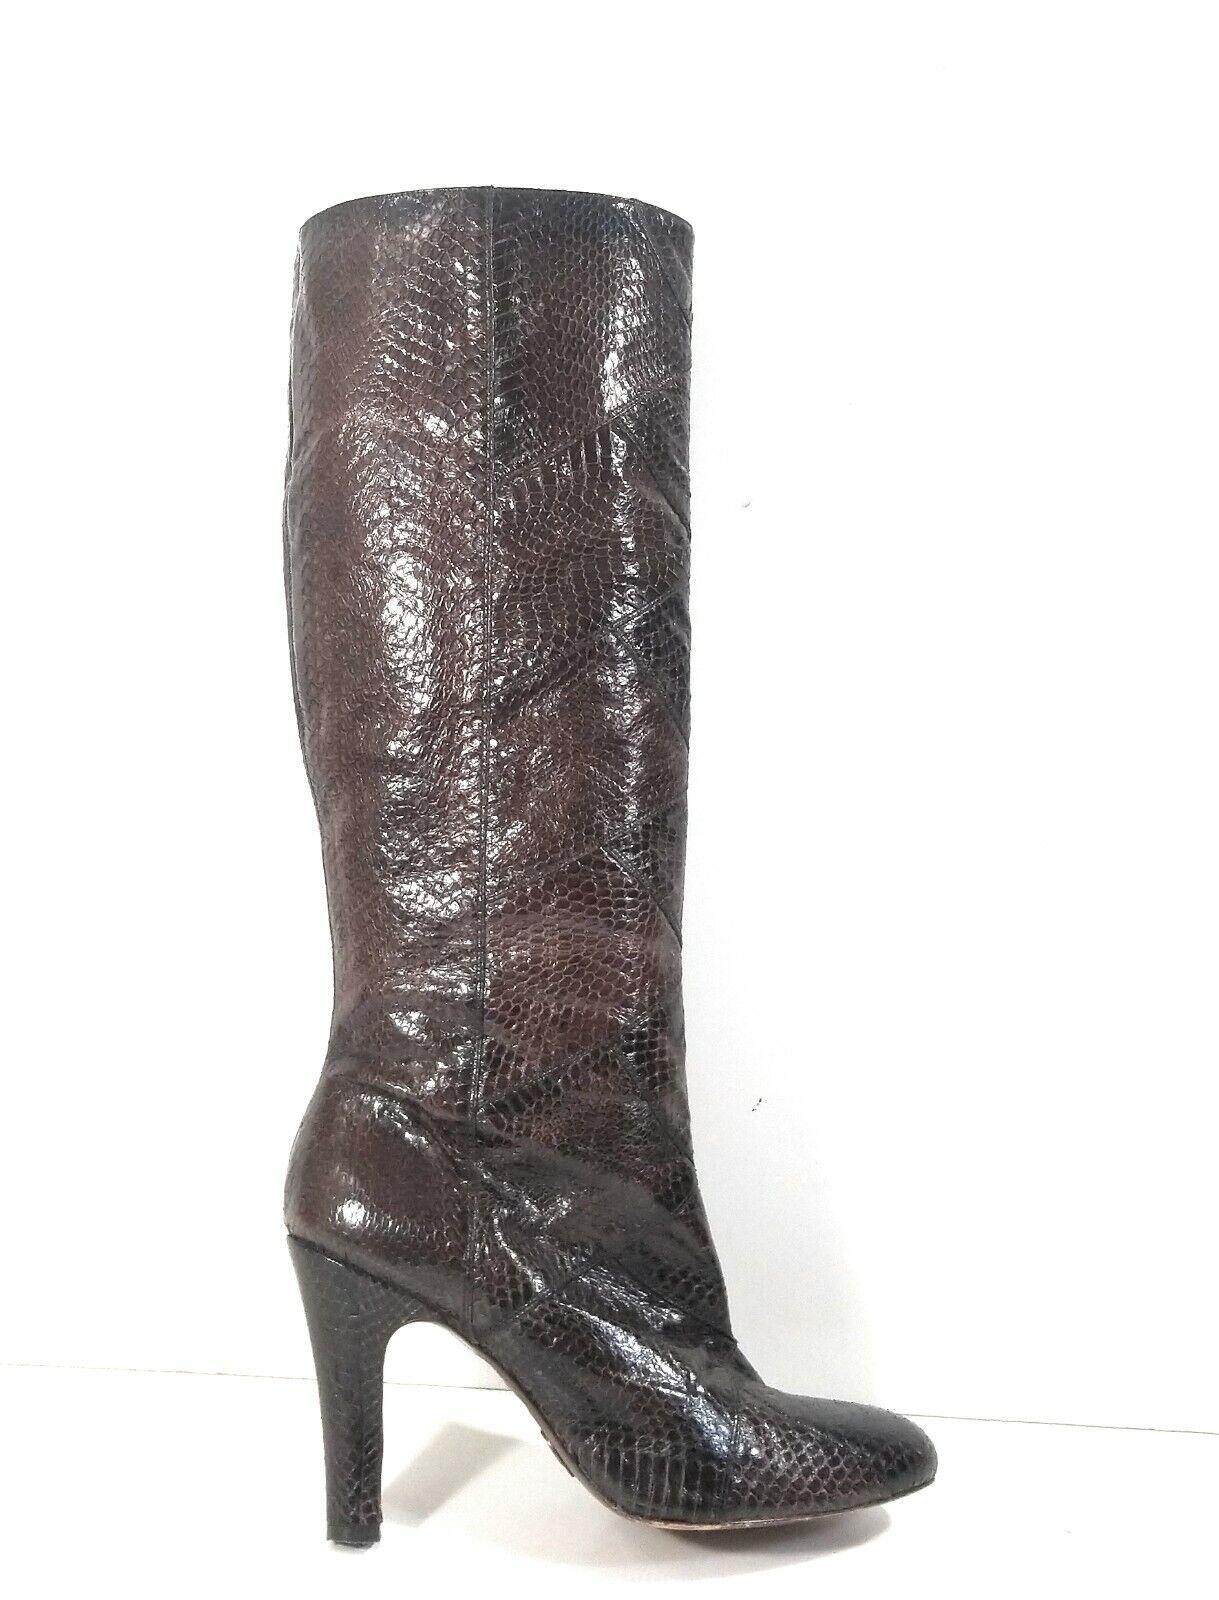 Frye 77731 Ava Tall Women Brown Tall Knee High Snakeskin Leather Boots Sz 8.5 M